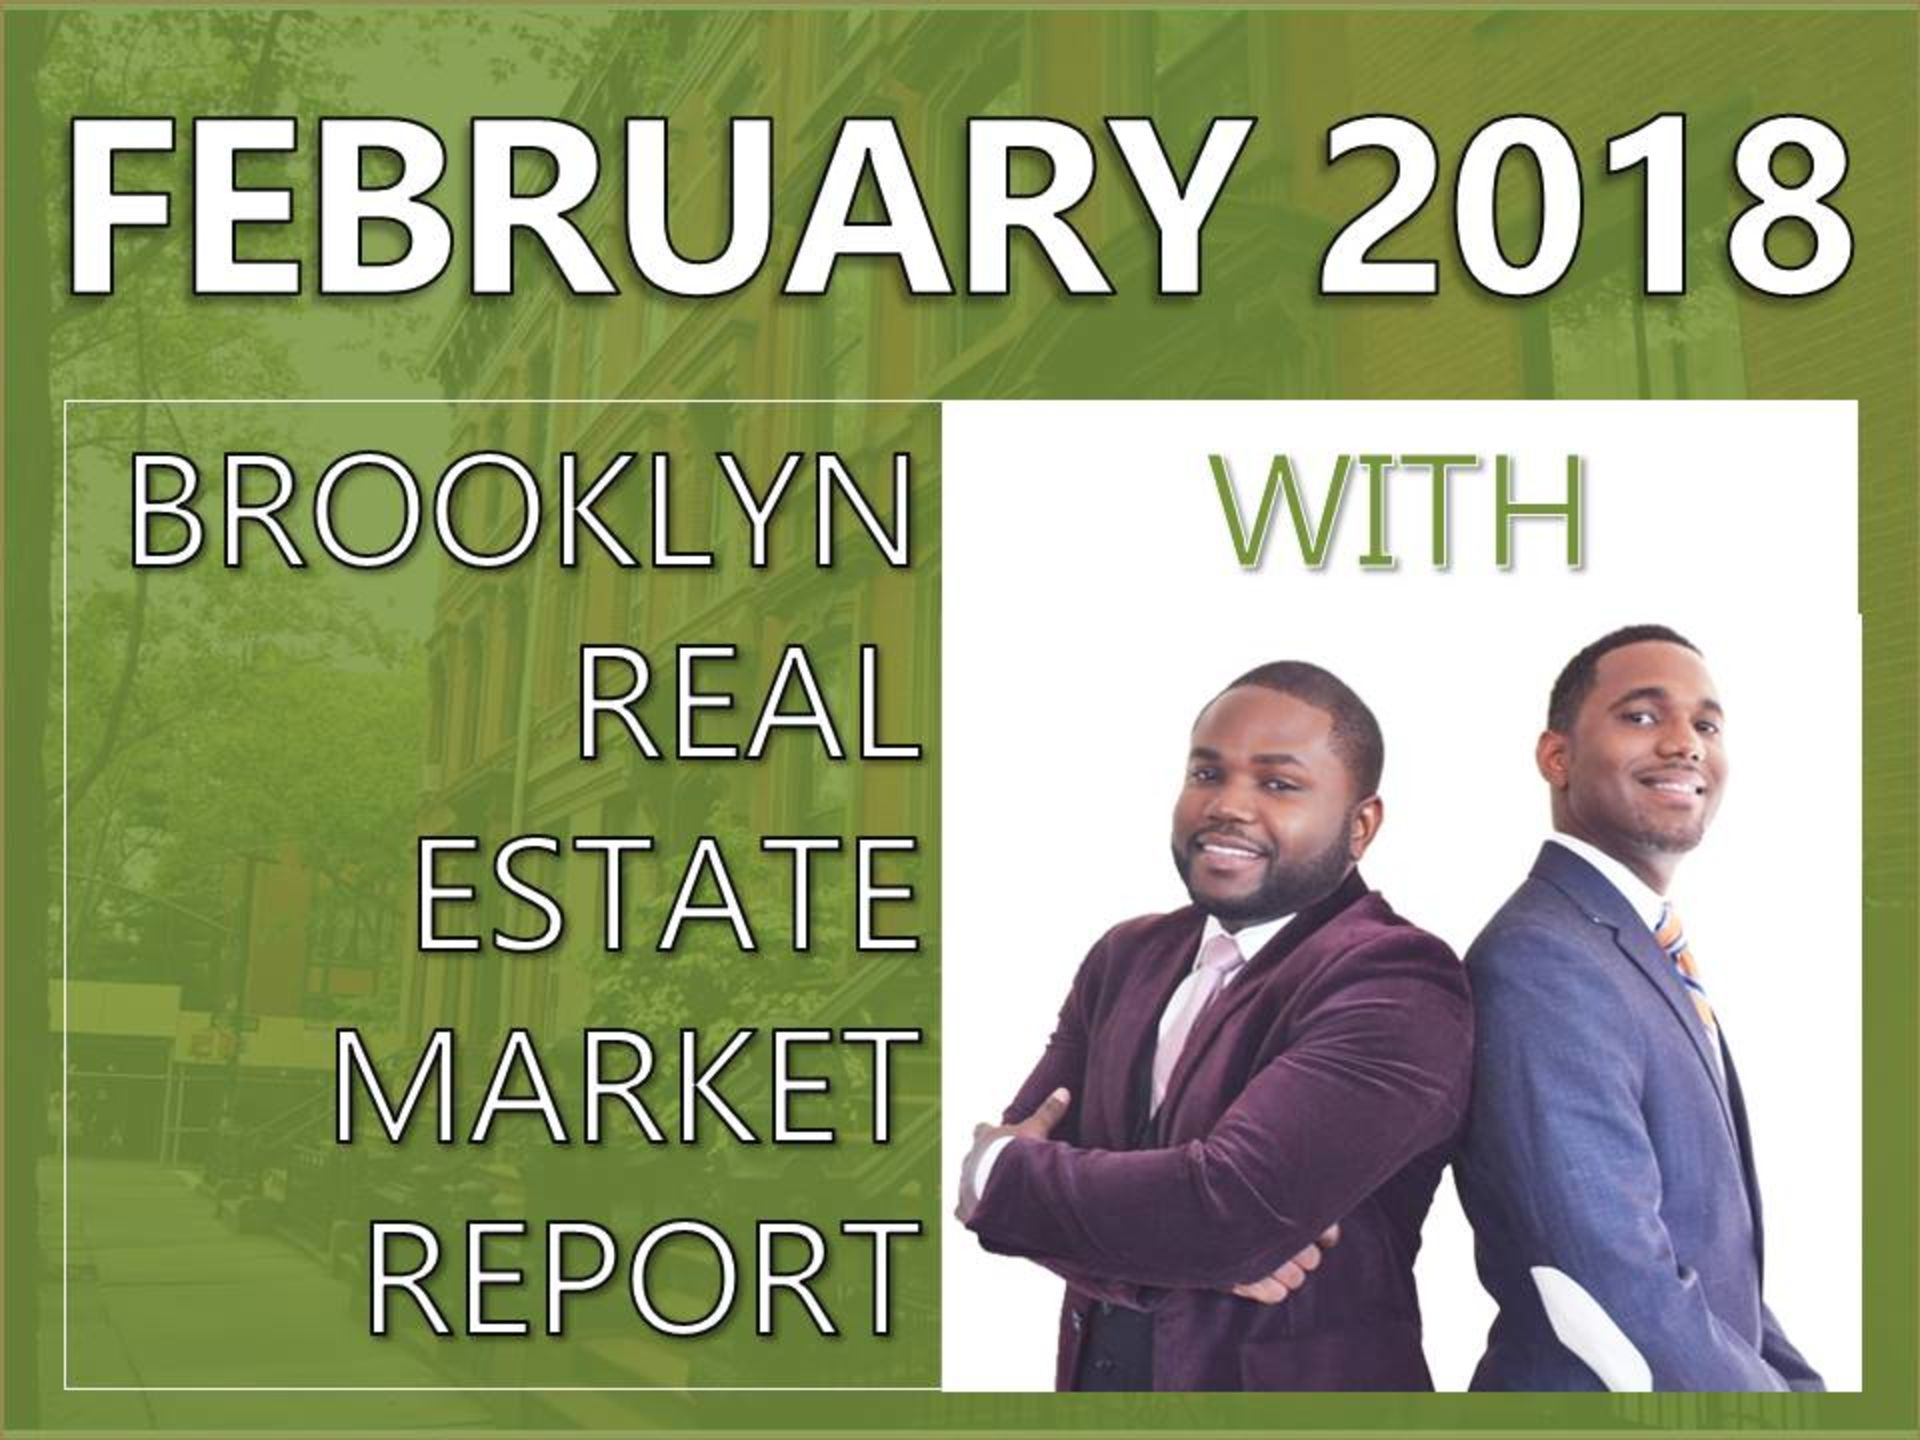 February 2018 Brooklyn Real Estate Market Report